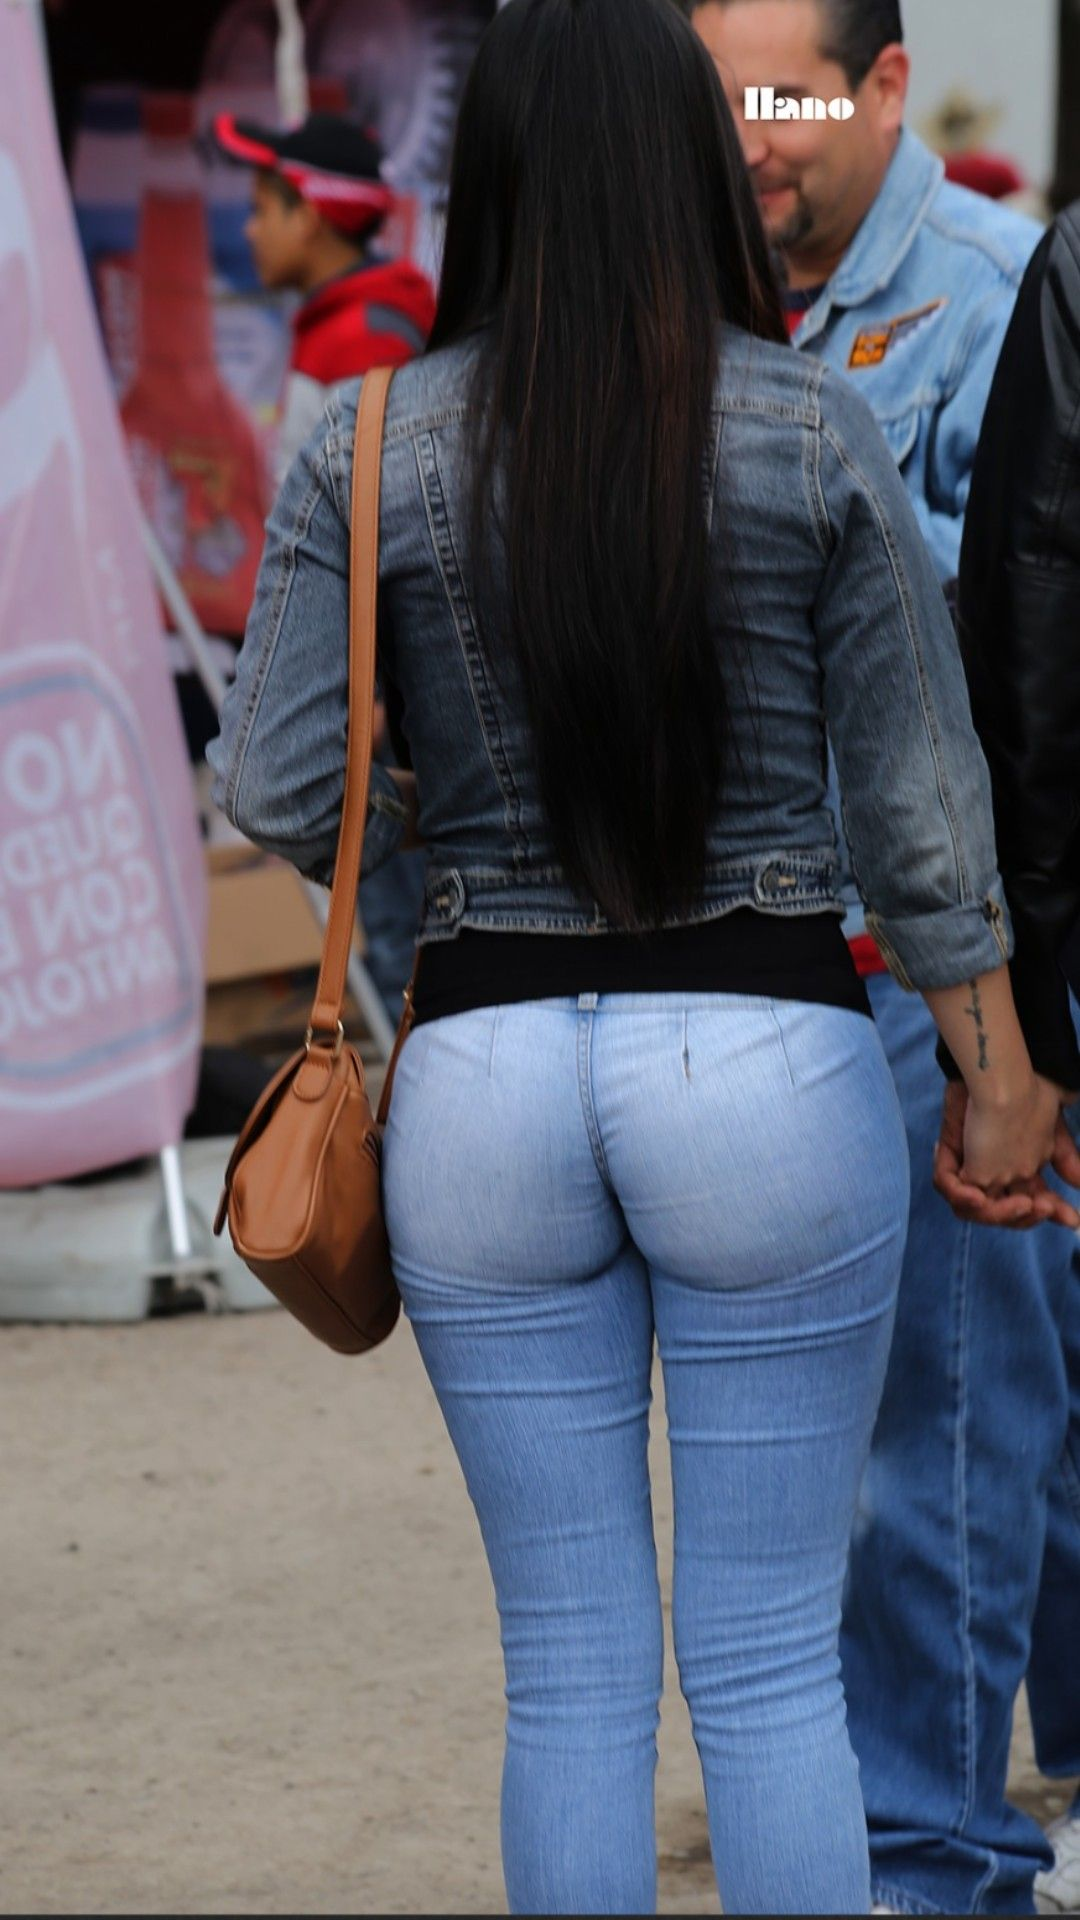 Ariel winter booty in tight jeans